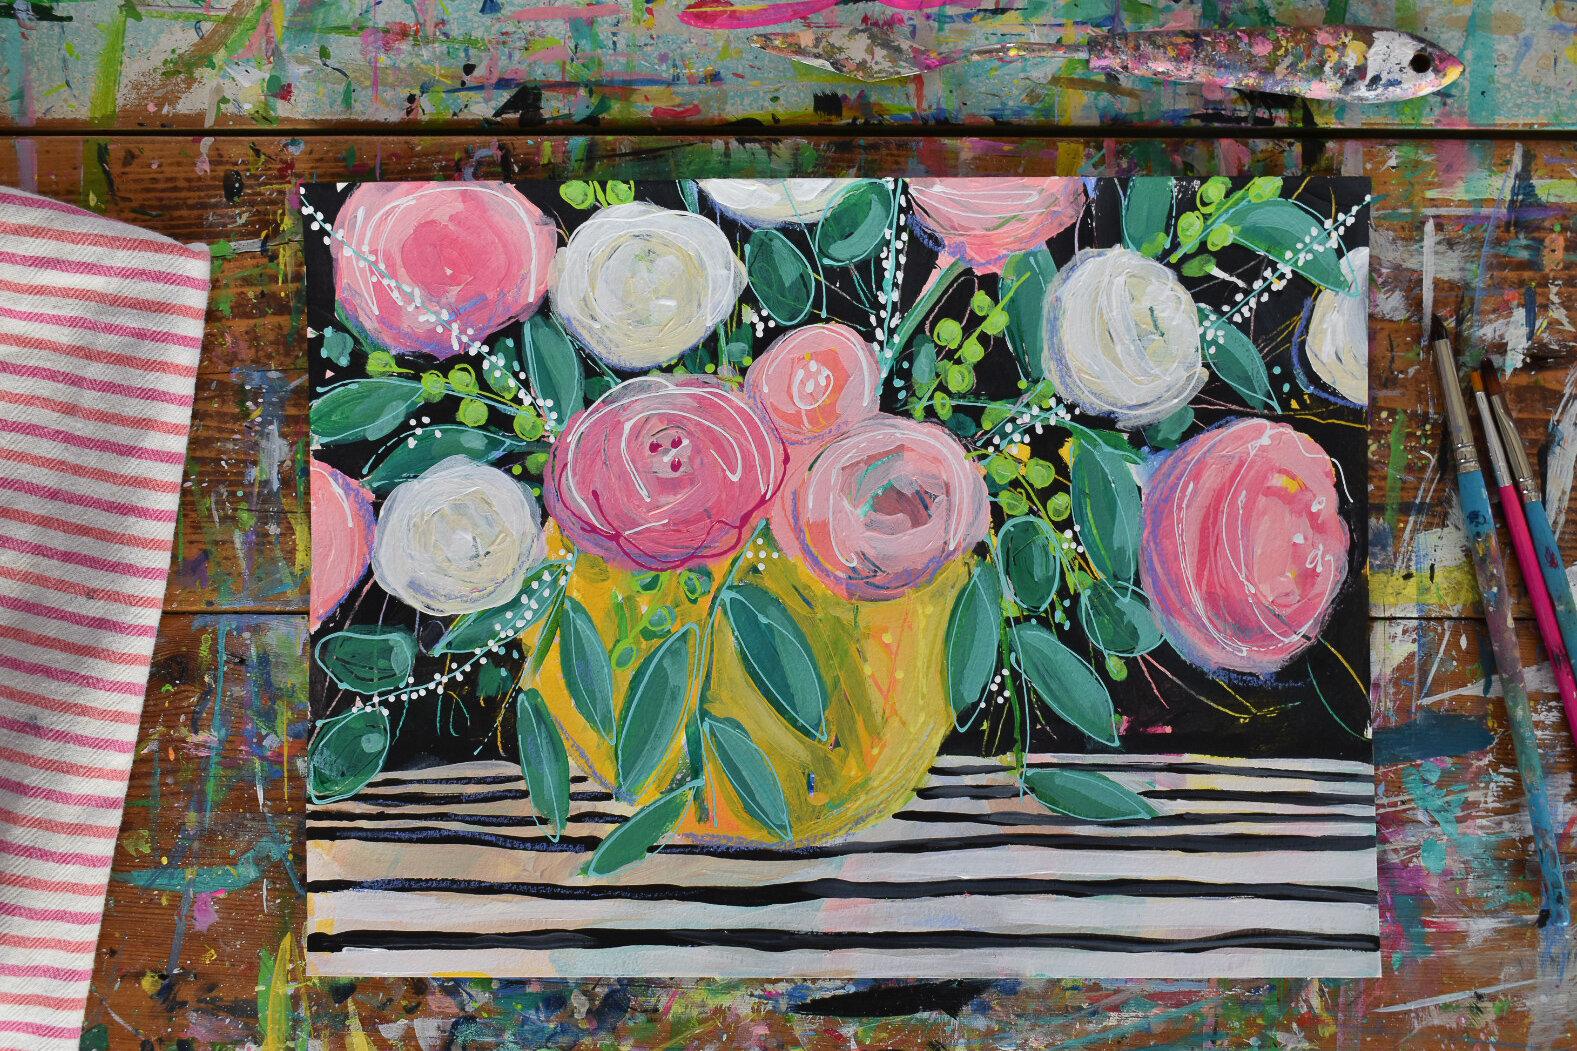 boho_eclectic_painting_art_stripes_daisyfaithart_pink_4.jpg